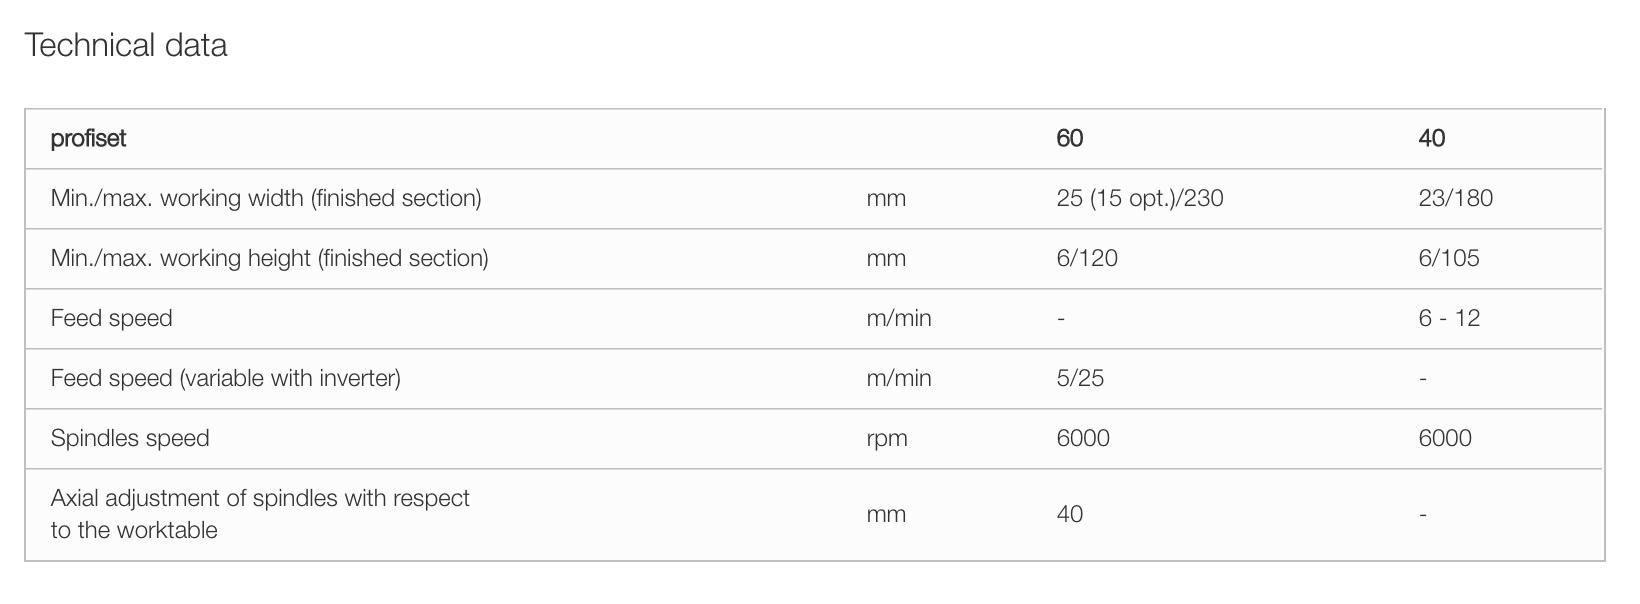 technical data of profiset 40